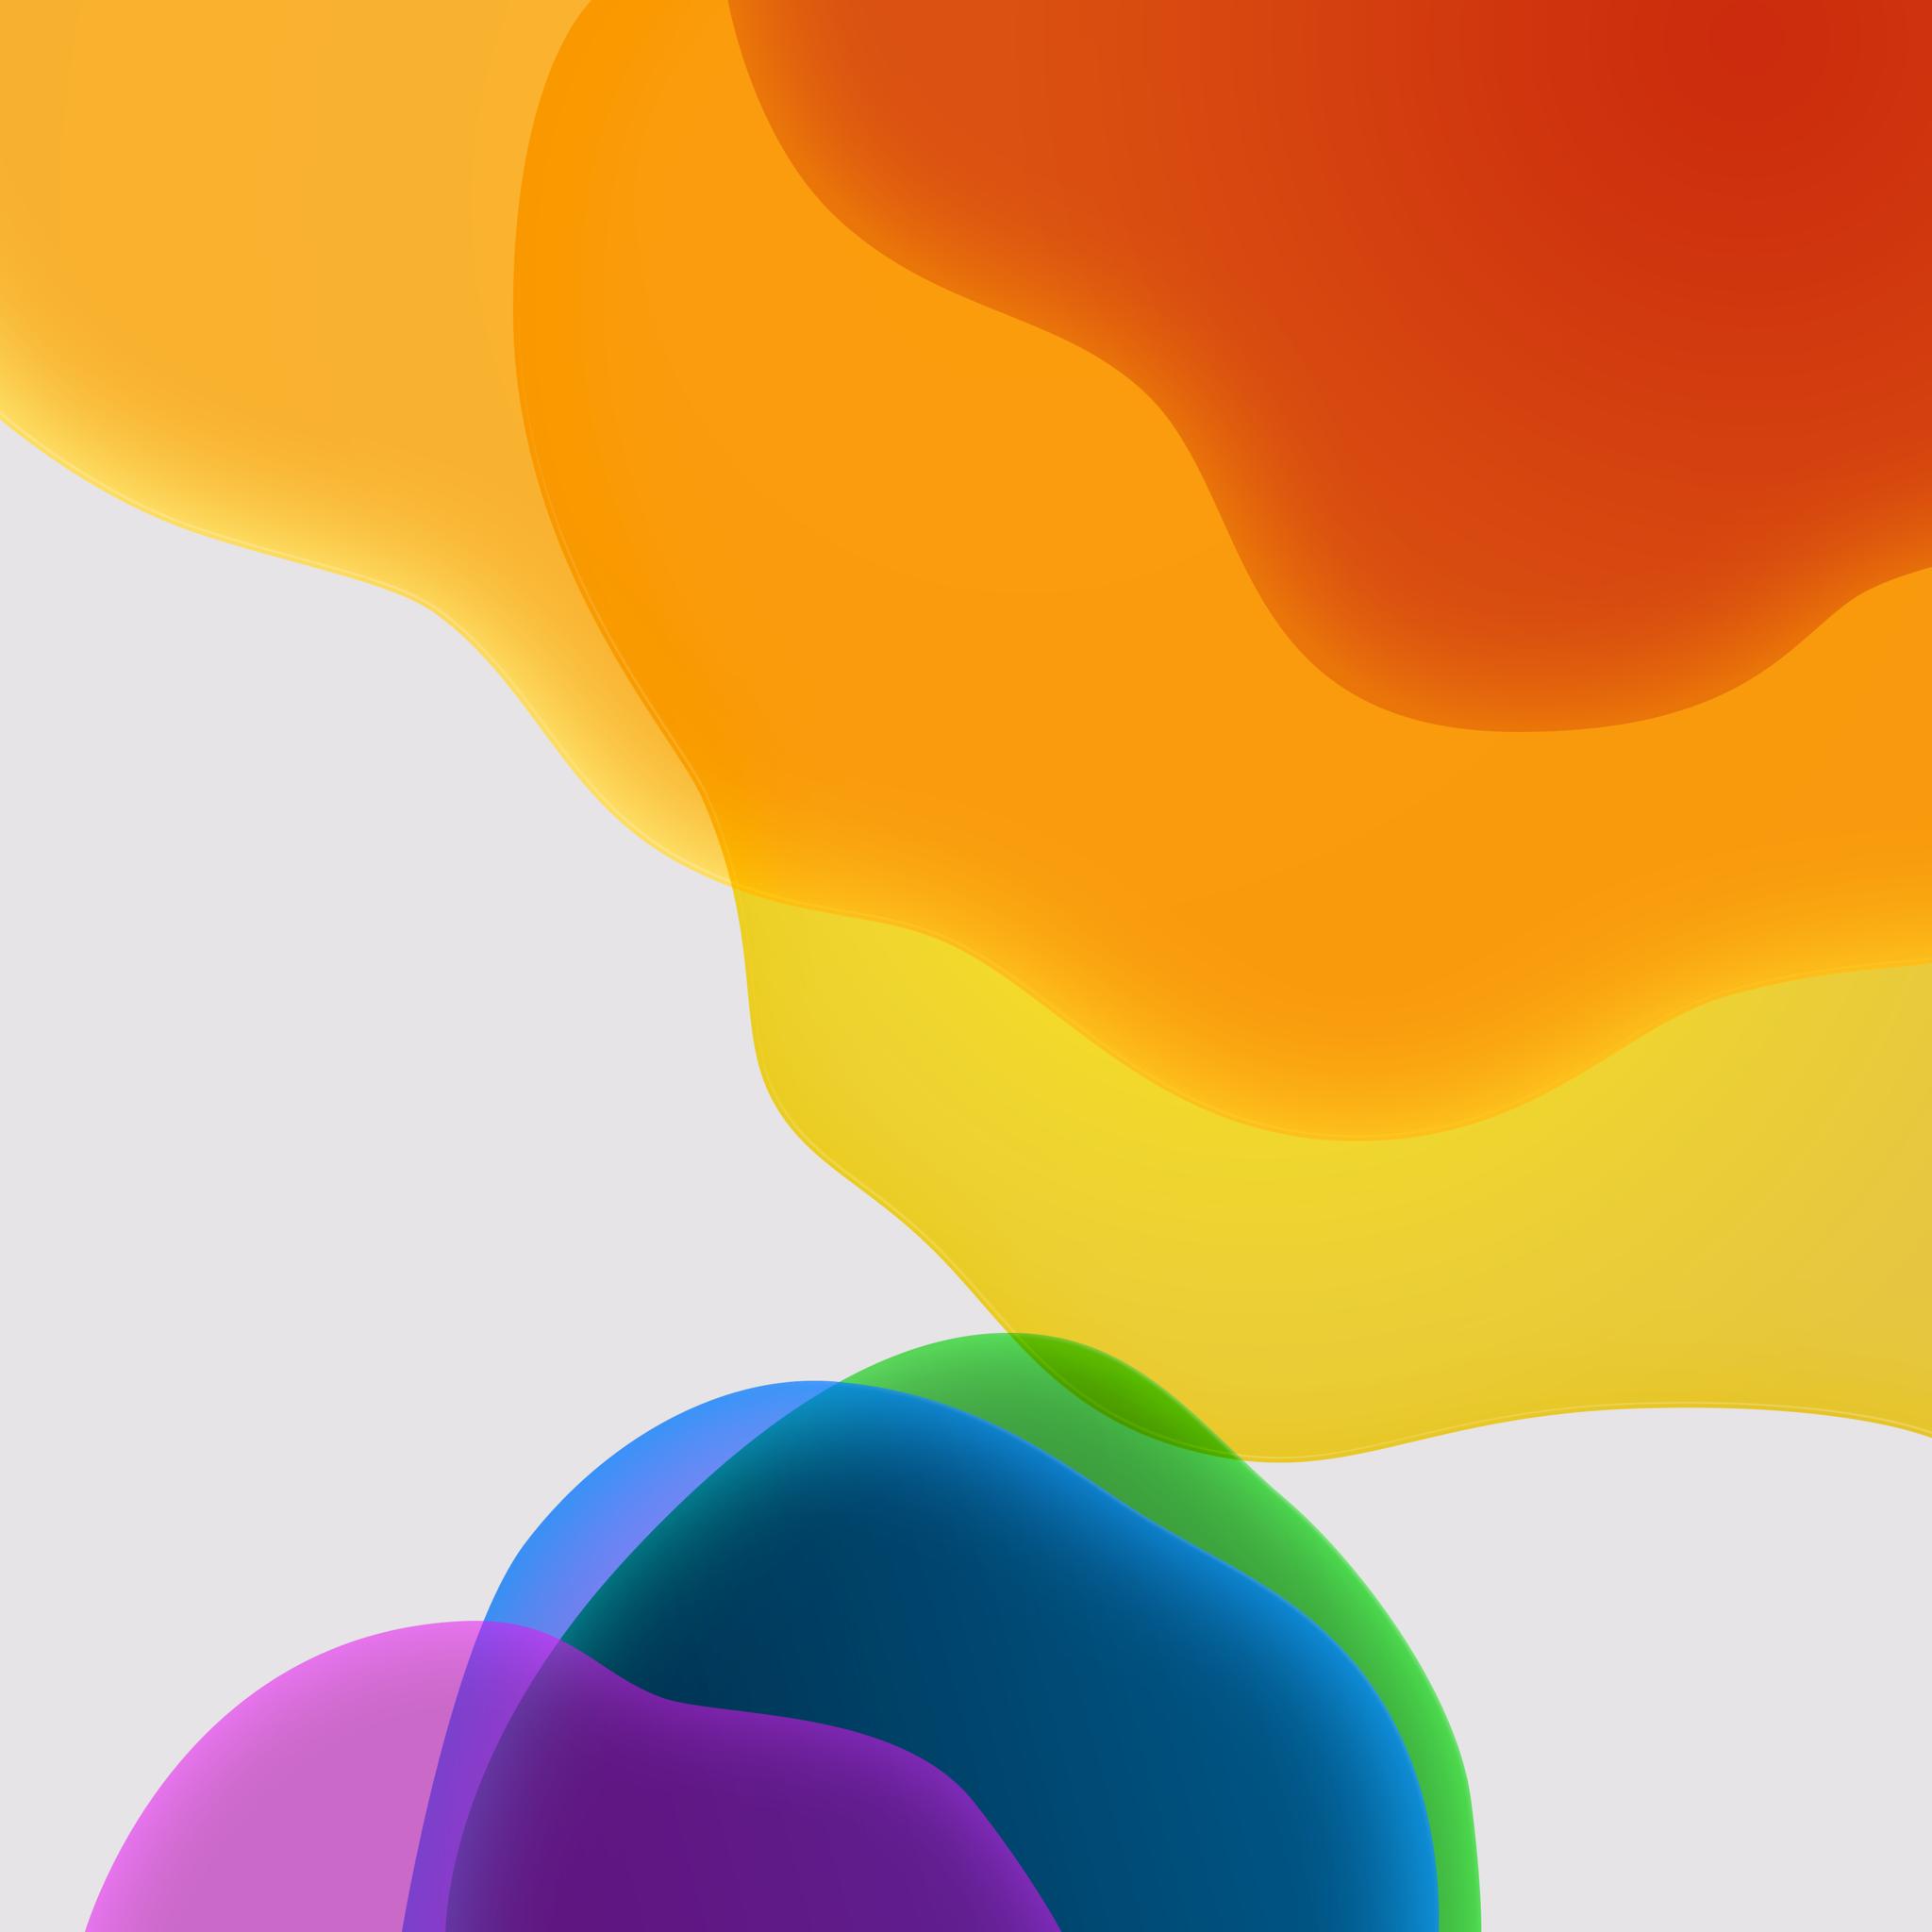 Pin By Pranavgupta On Iphone Wallpaper In 2020